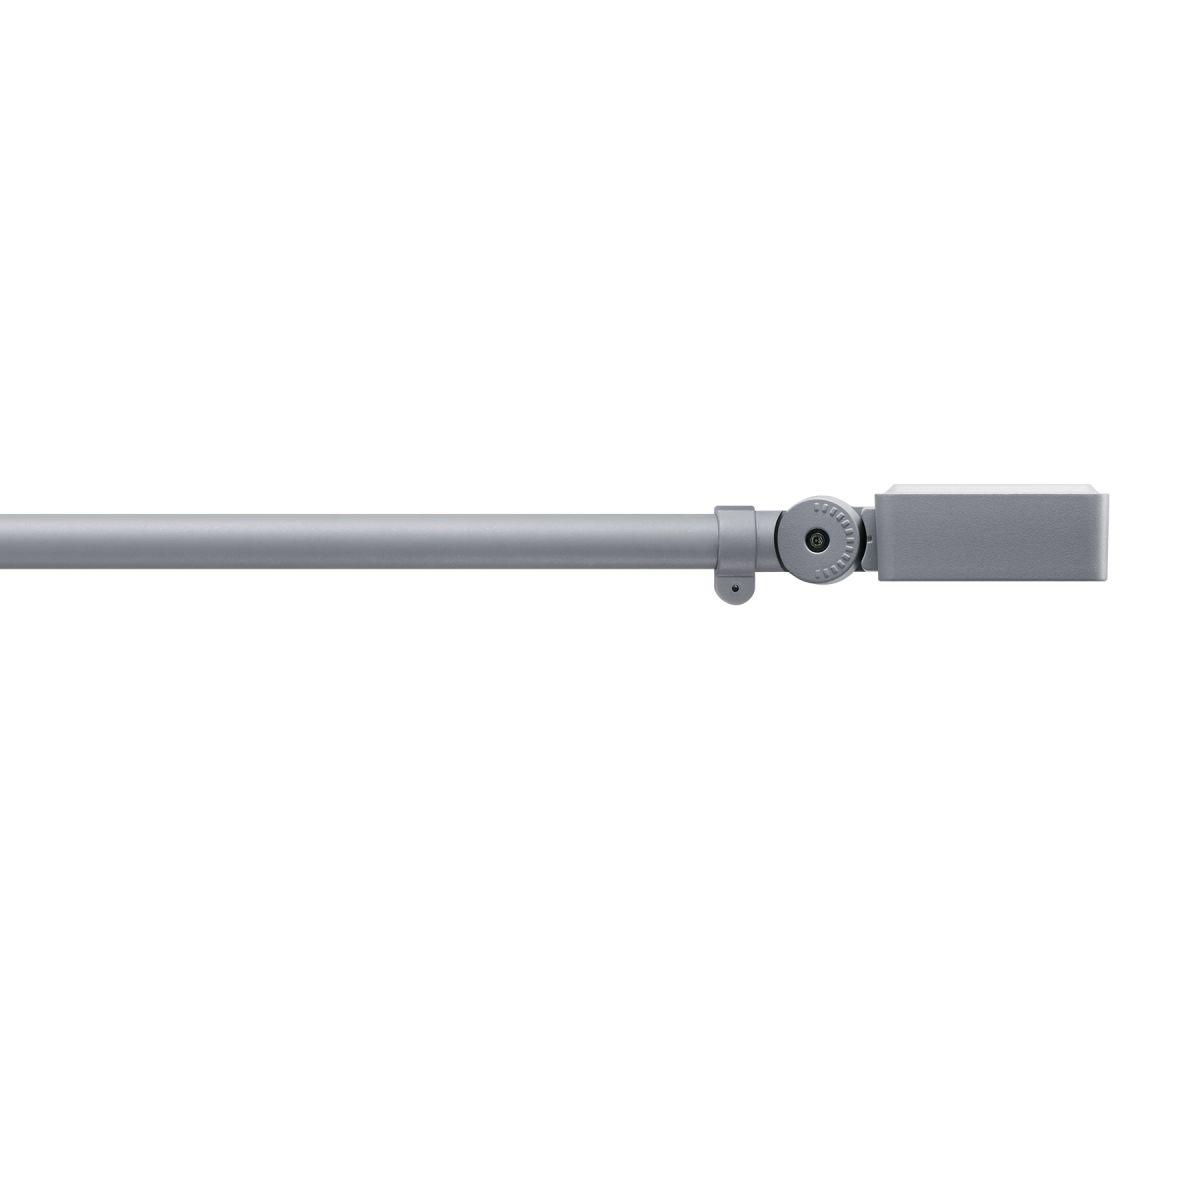 Mini ALPHA Square - Gear Arm